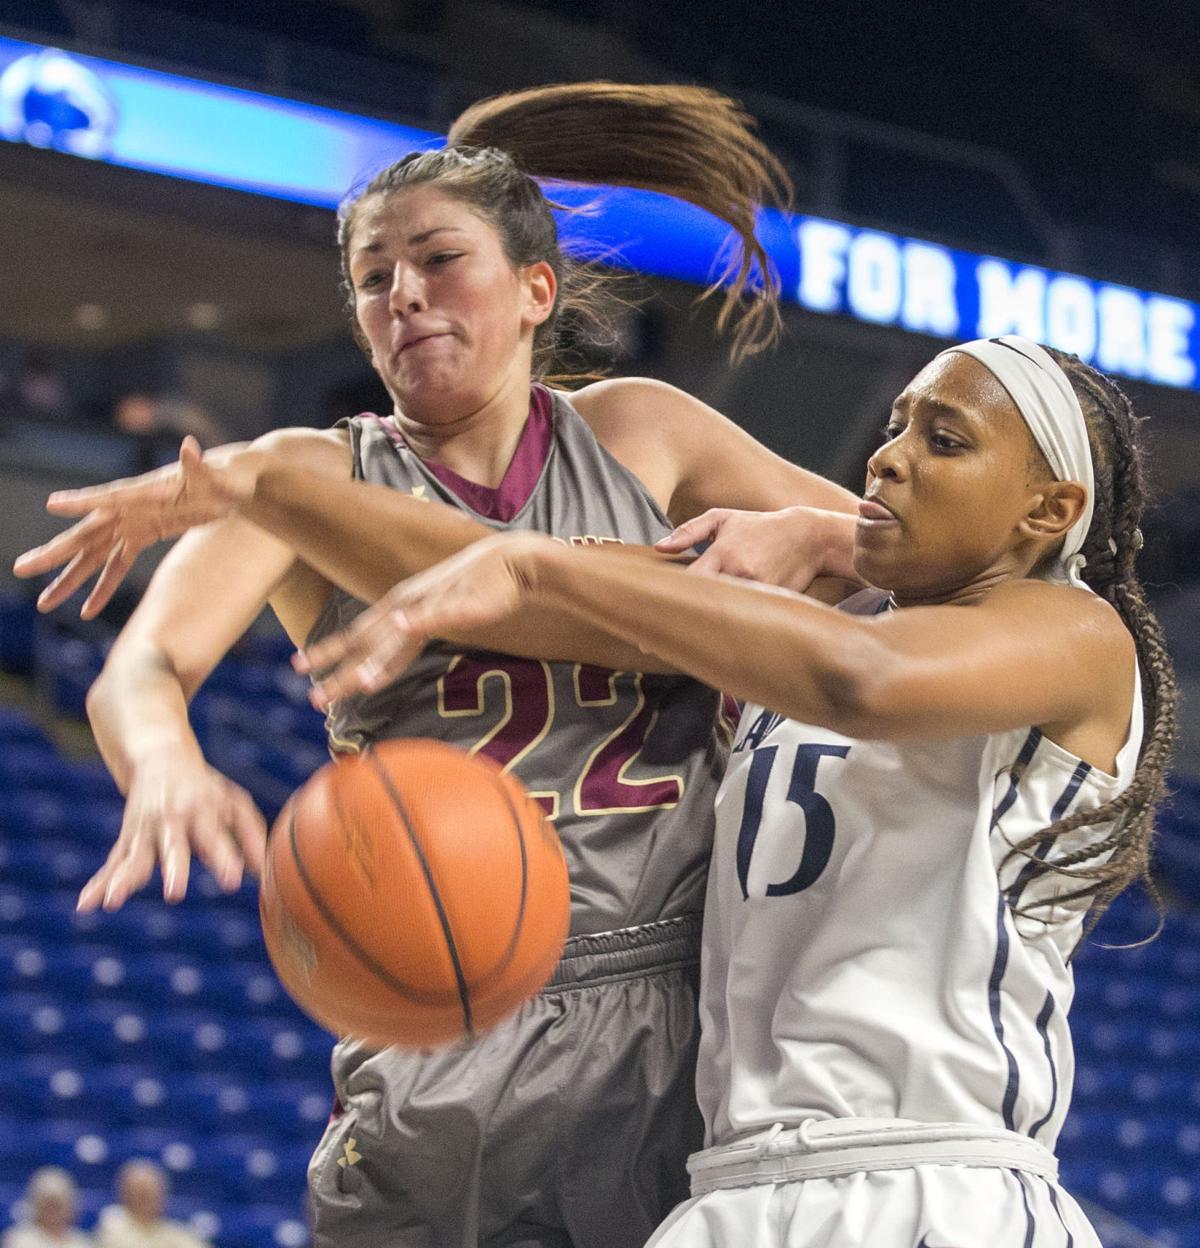 Women's basketball, Mitchell (15)